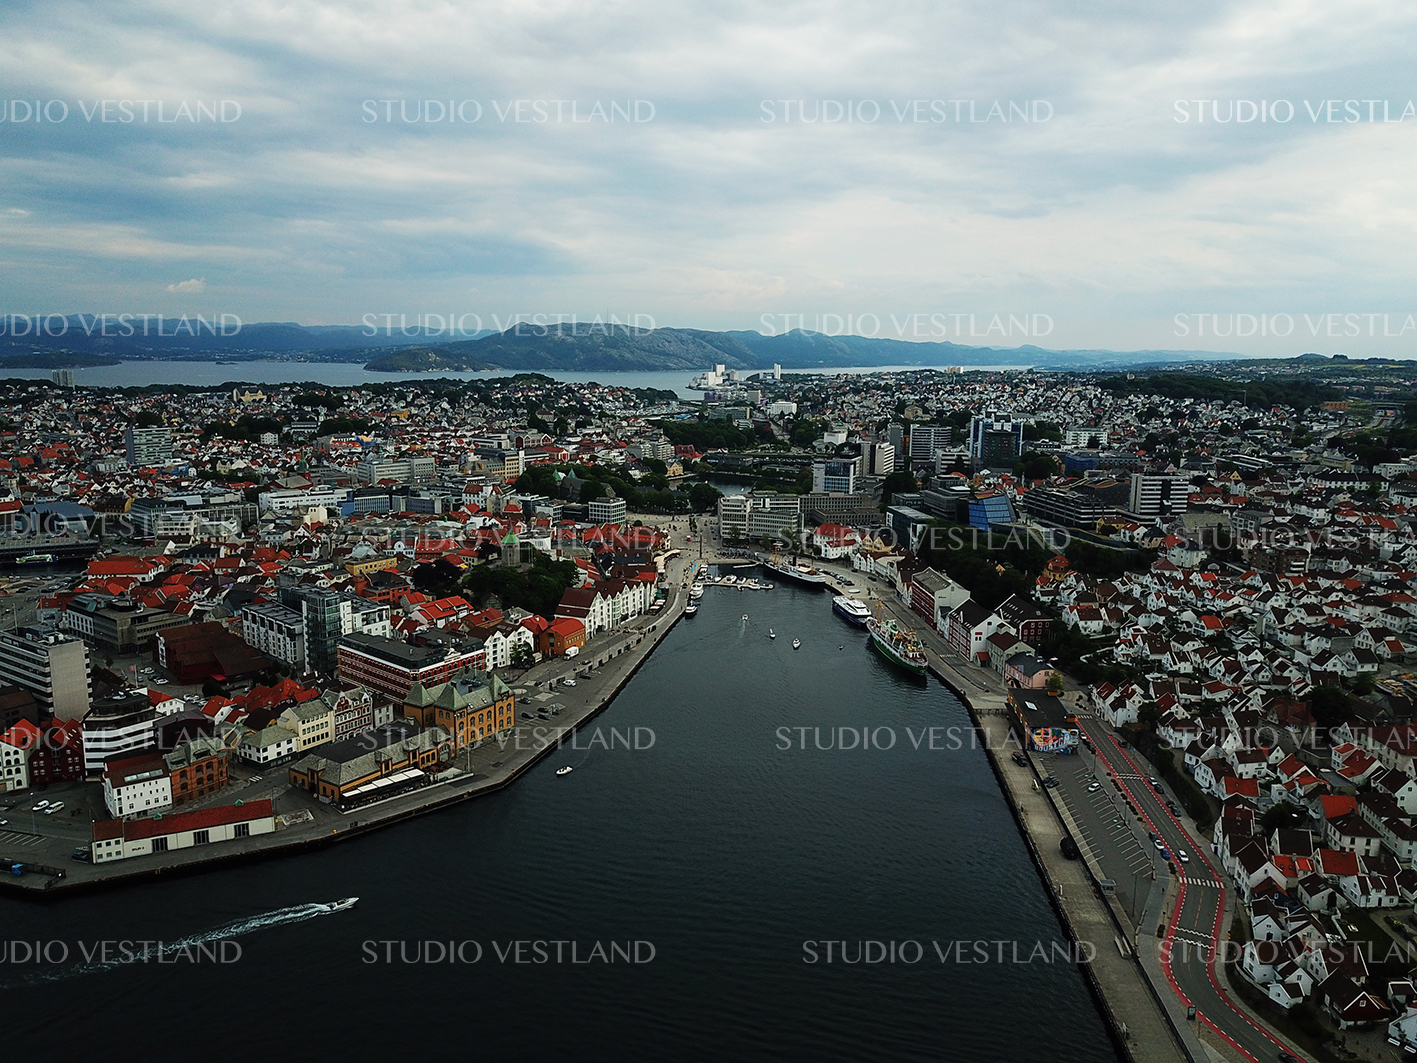 Studio Vestland - Stavanger 30